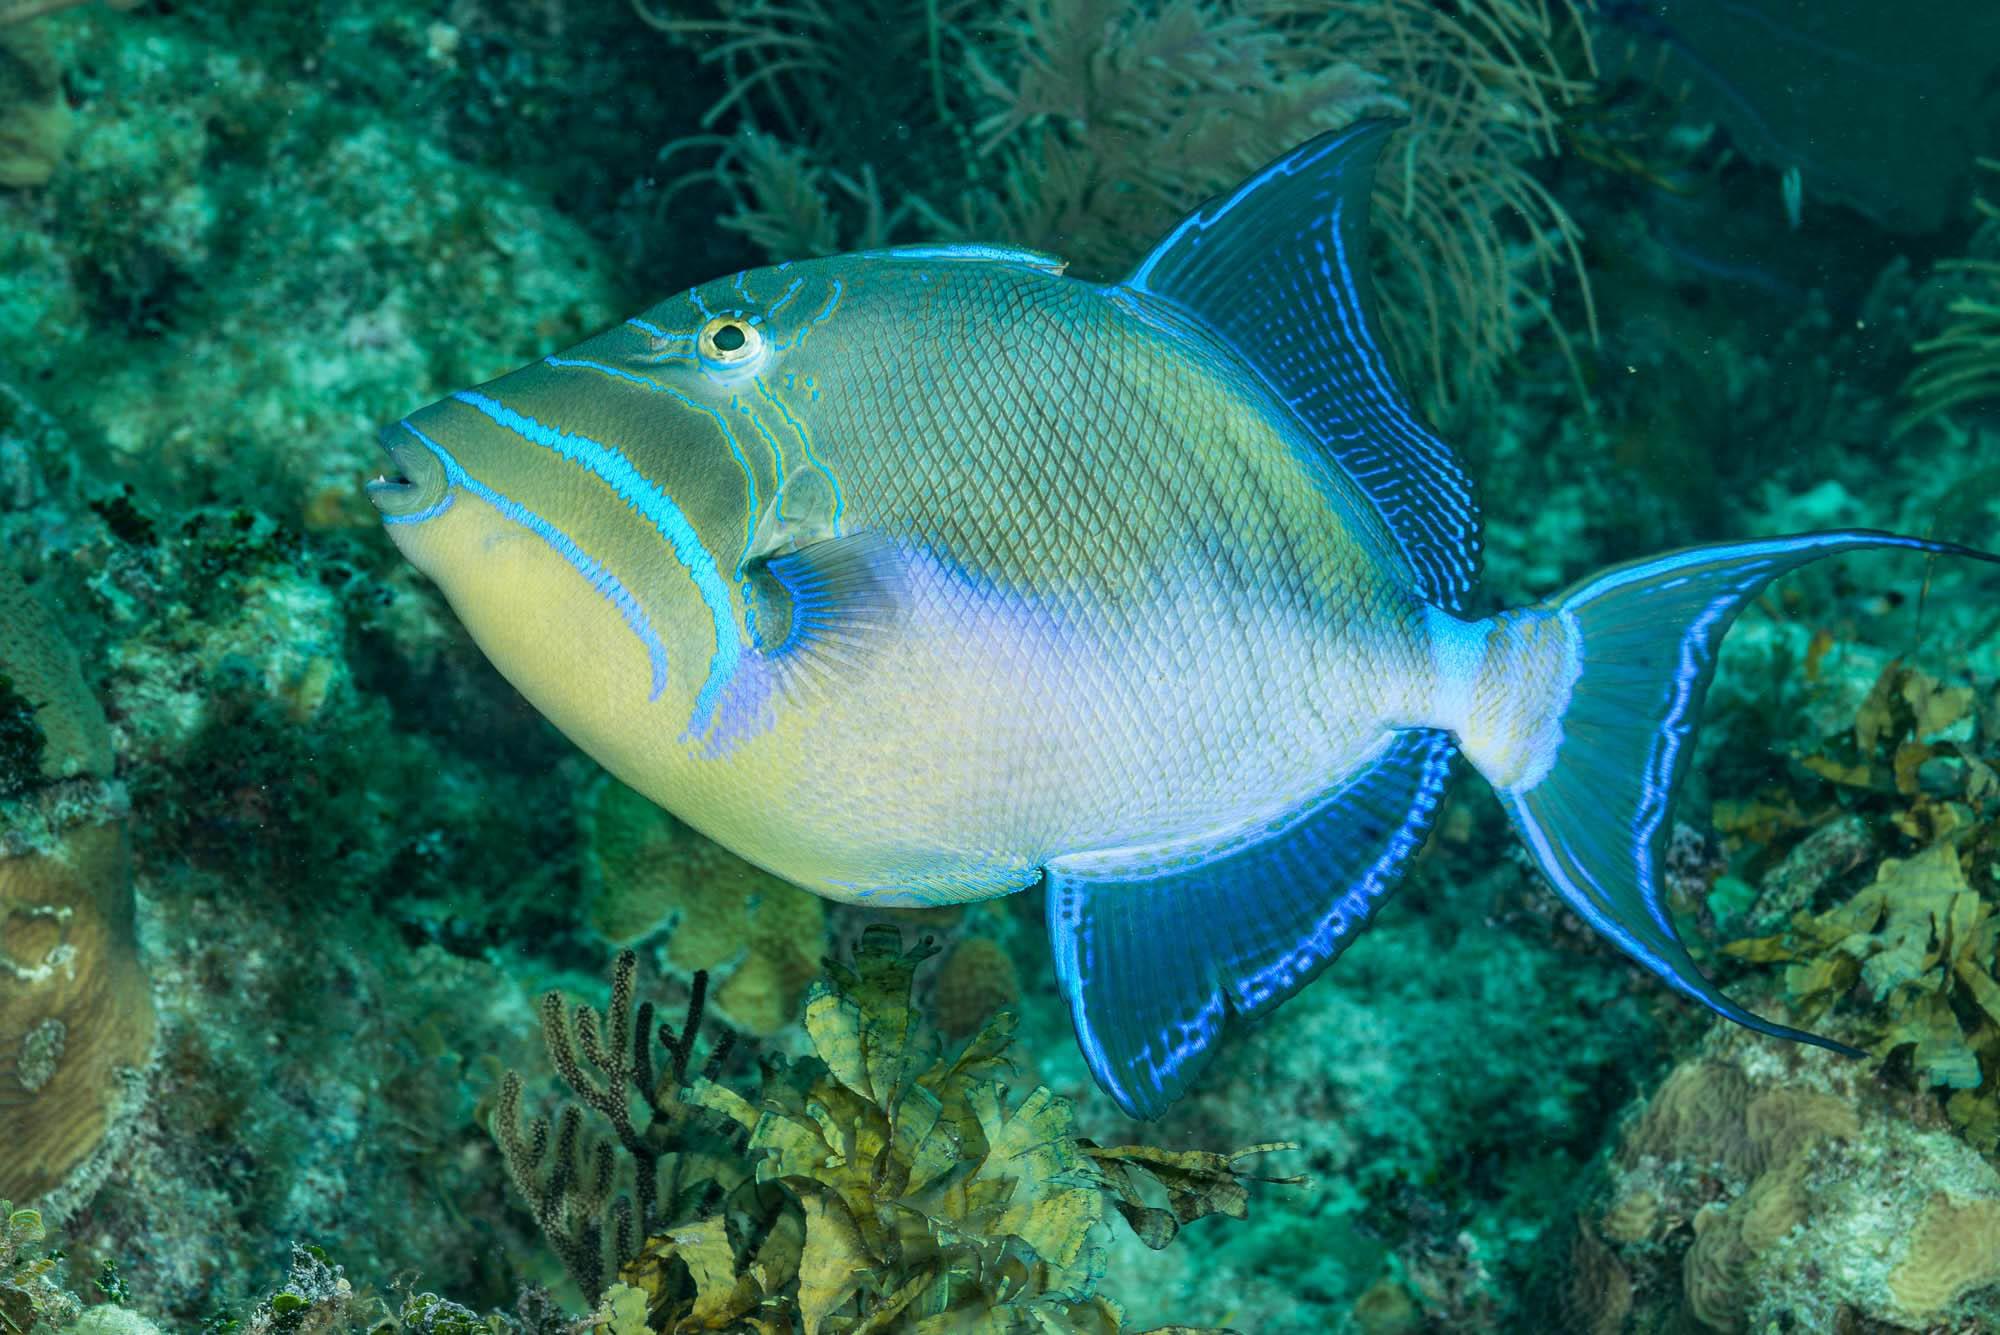 triggerfish, Jardines De La Reina credit: DAVID GROSS / CORAL REEF IMAGE BANK